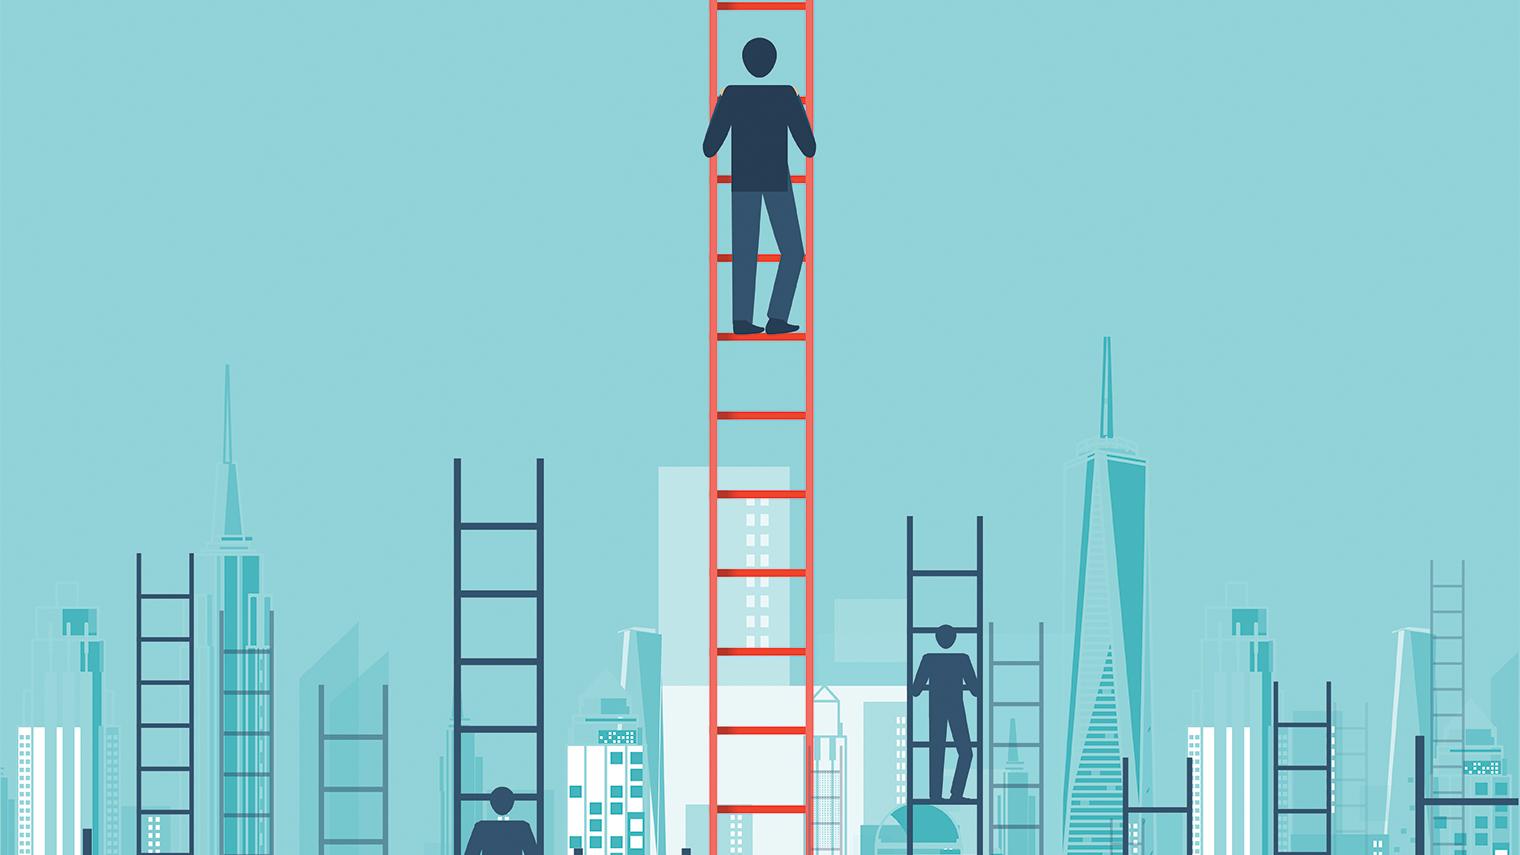 Climbing the career ladder illustration